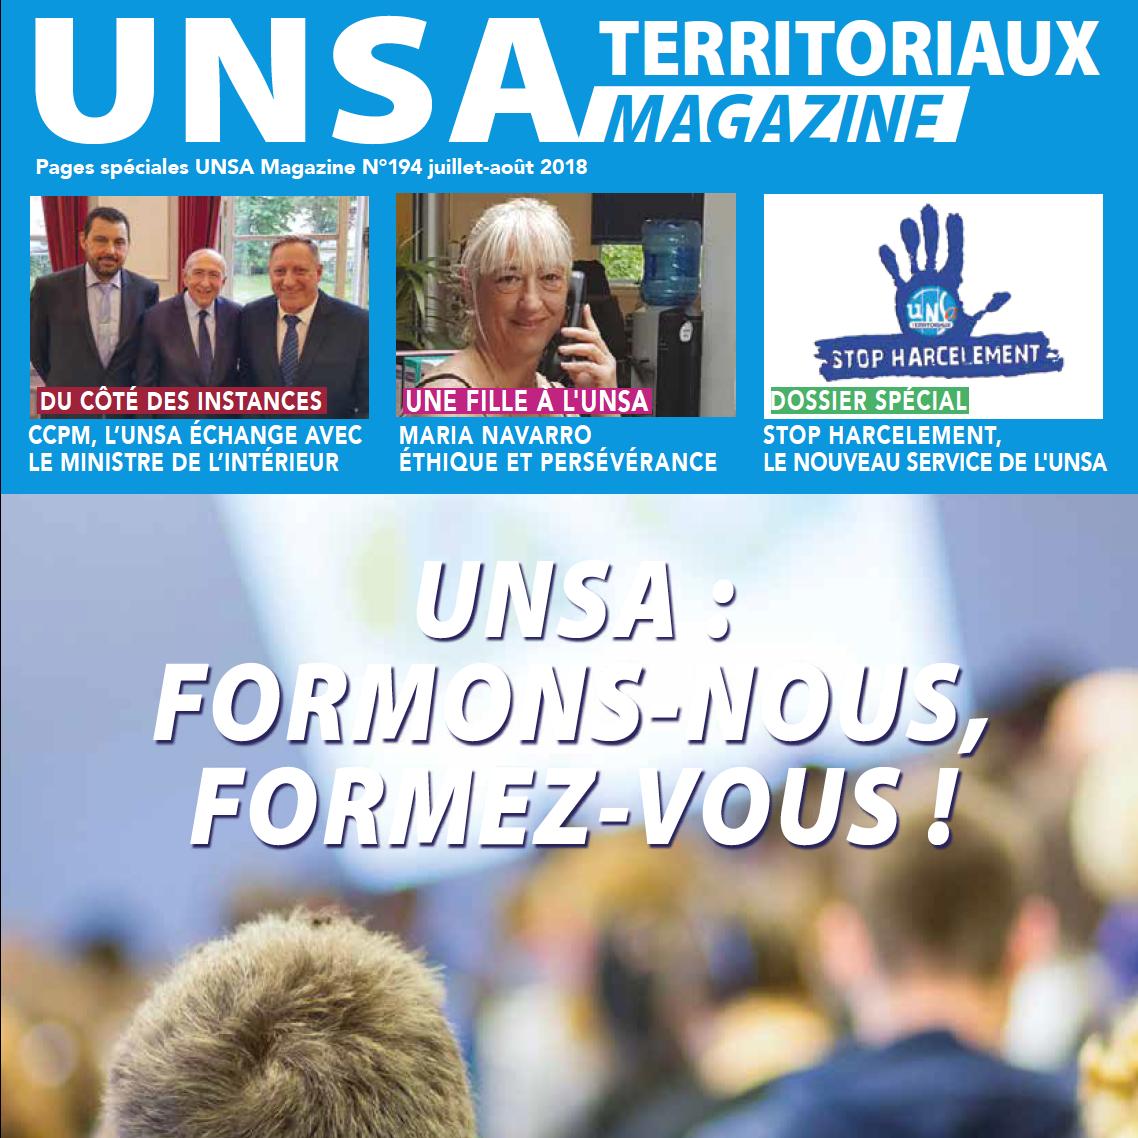 [Magazine] Le numéro 194 de l'UNSA Territoriaux magazine est sorti !